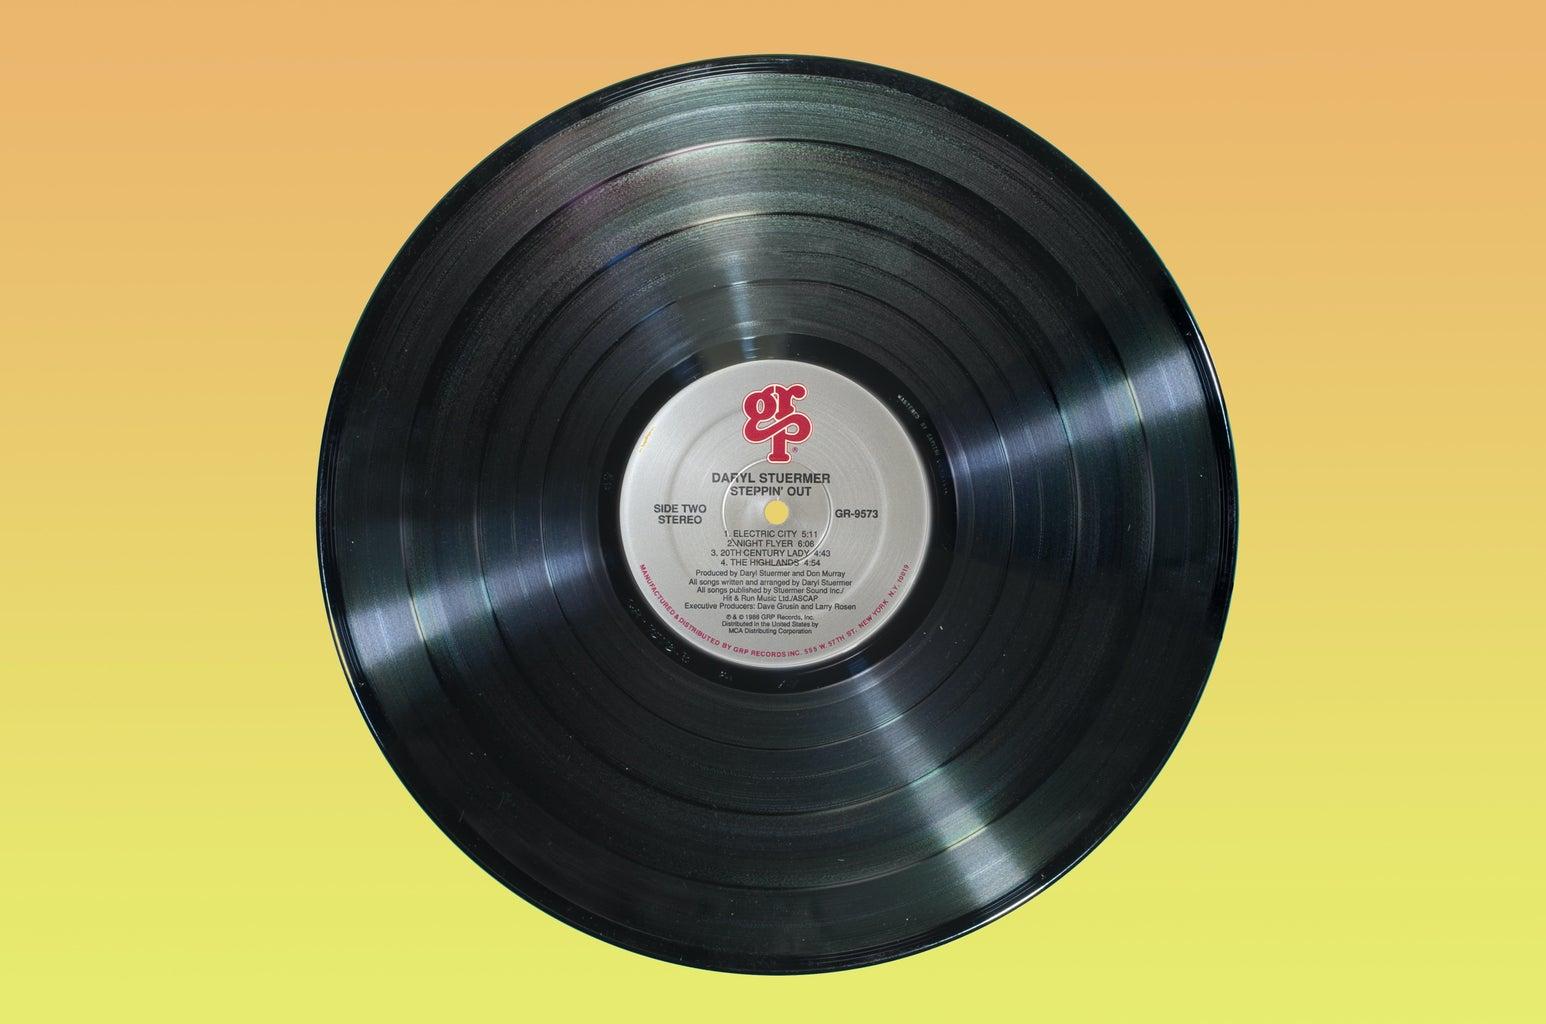 vinyl record on yellow background